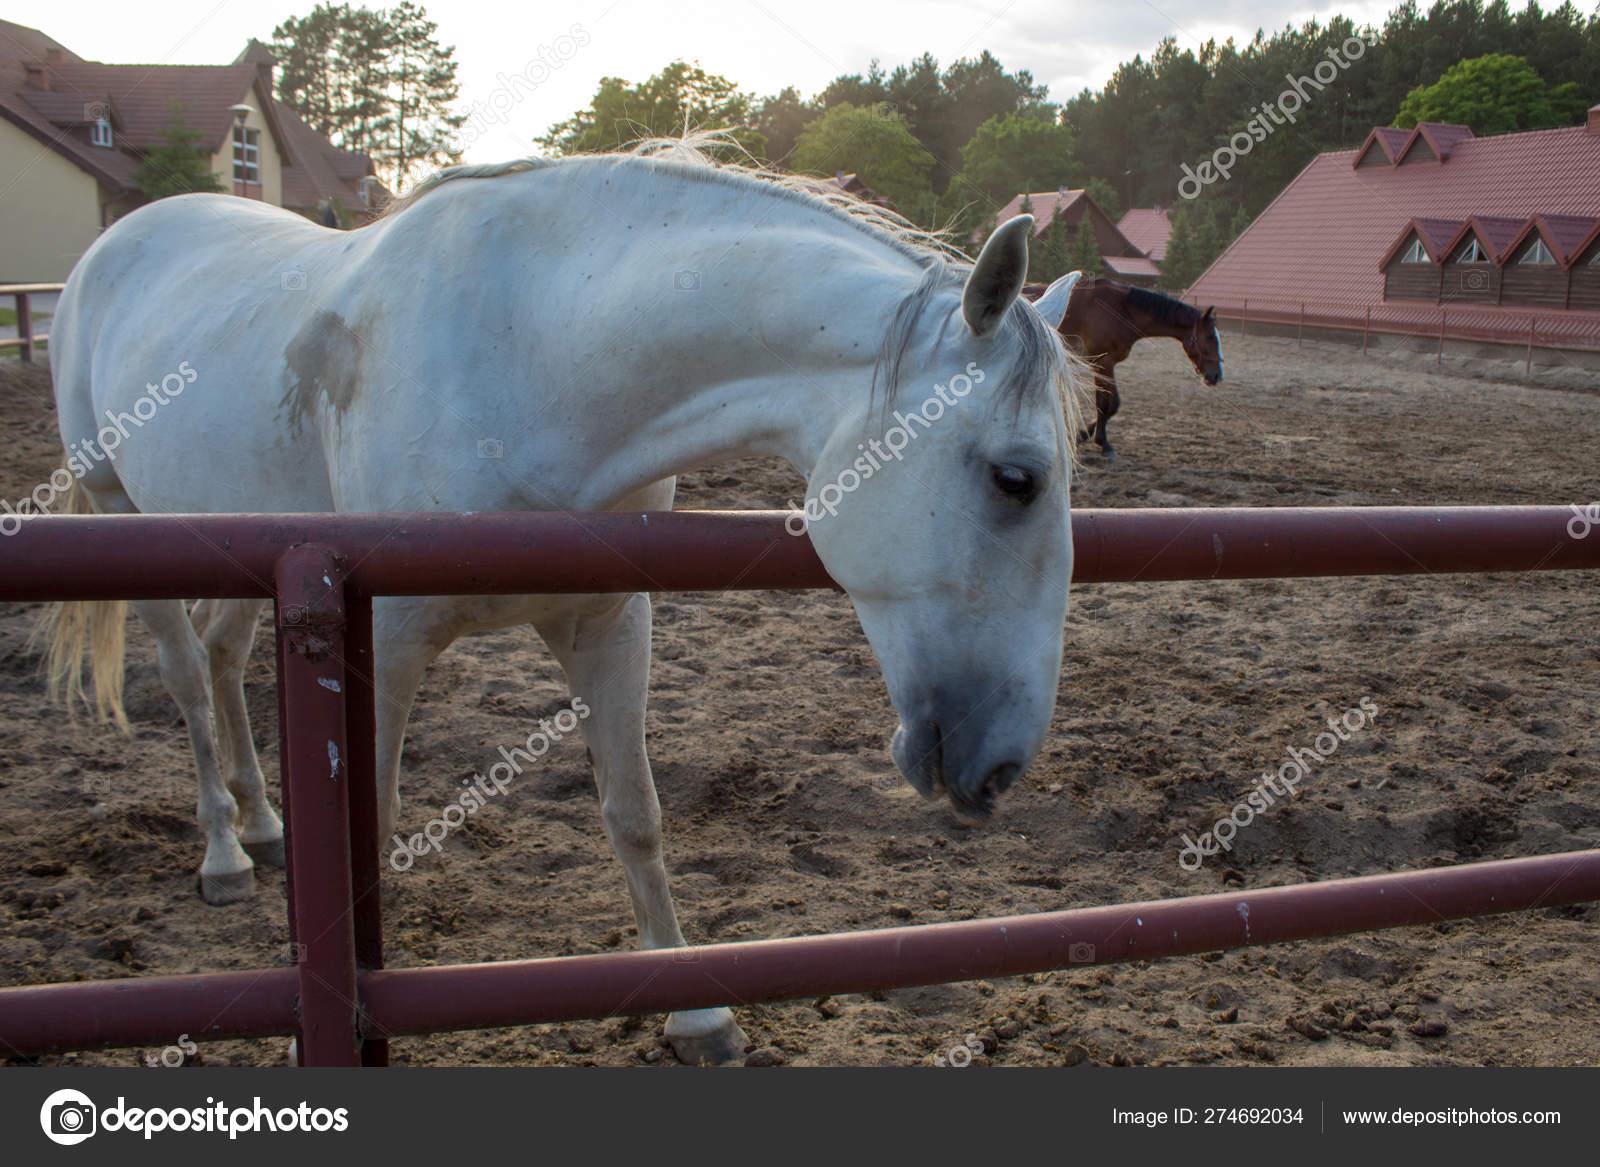 Grazing Beautiful White Horse Farm Rays Setting Summer Sun Stock Photo C Olenaholianskaphoto 274692034